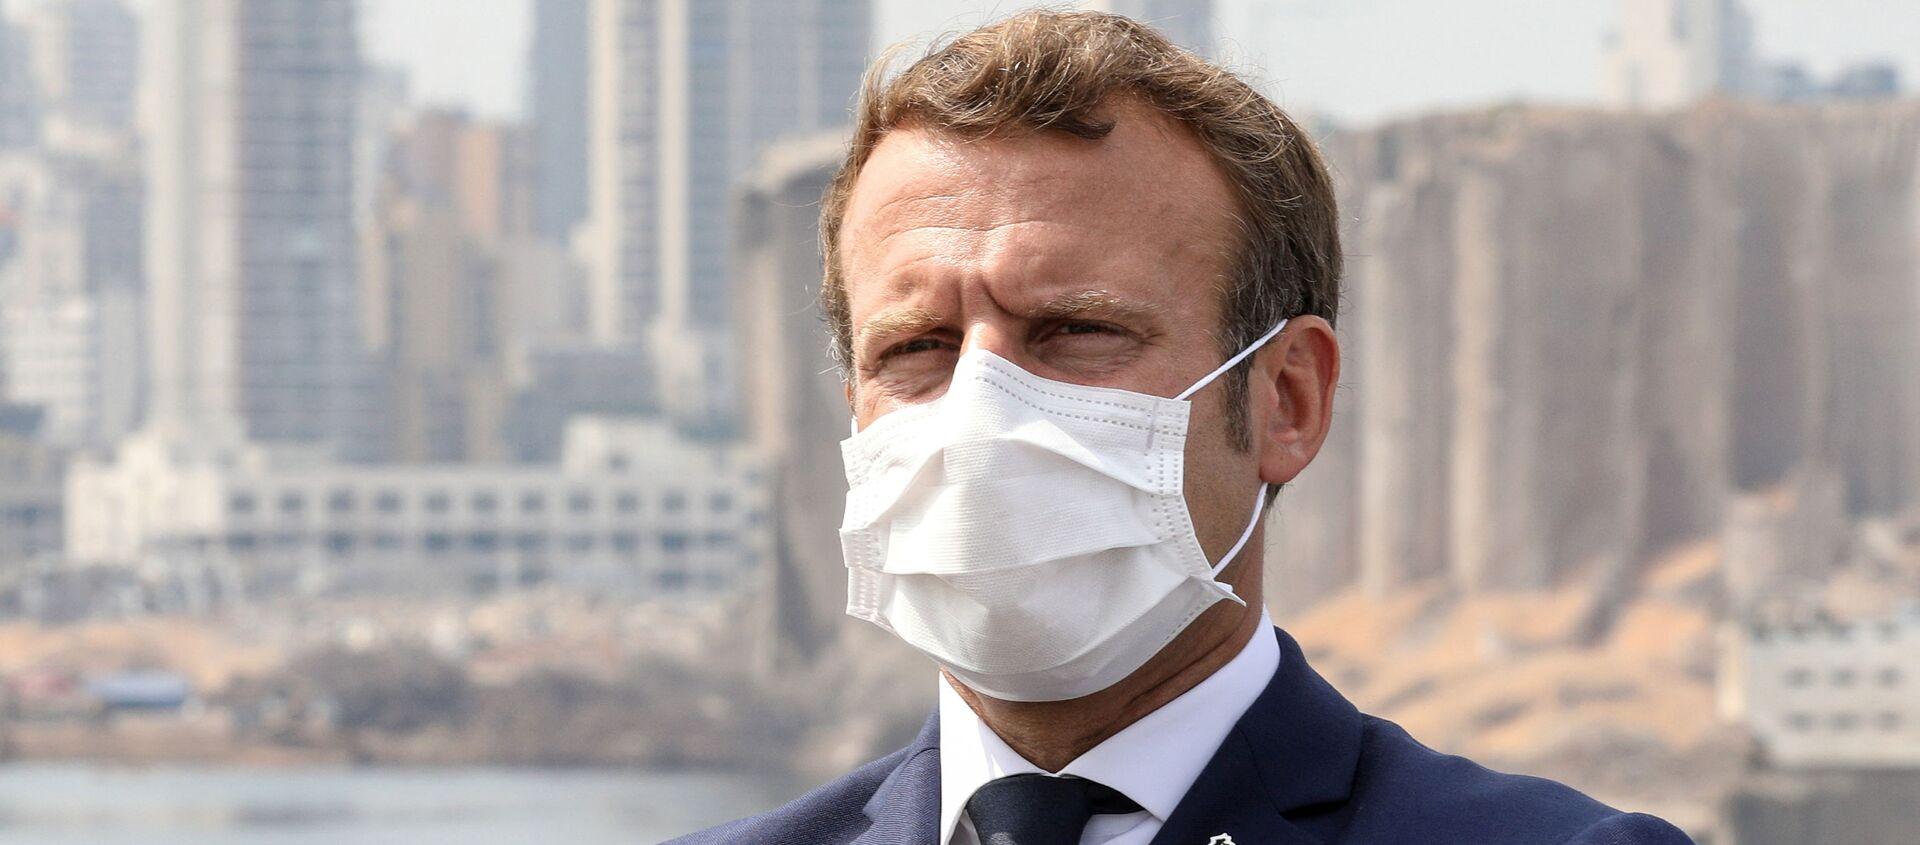 Emmanuel Macron, presidente de Francia, en Beirut - Sputnik Mundo, 1920, 02.09.2020